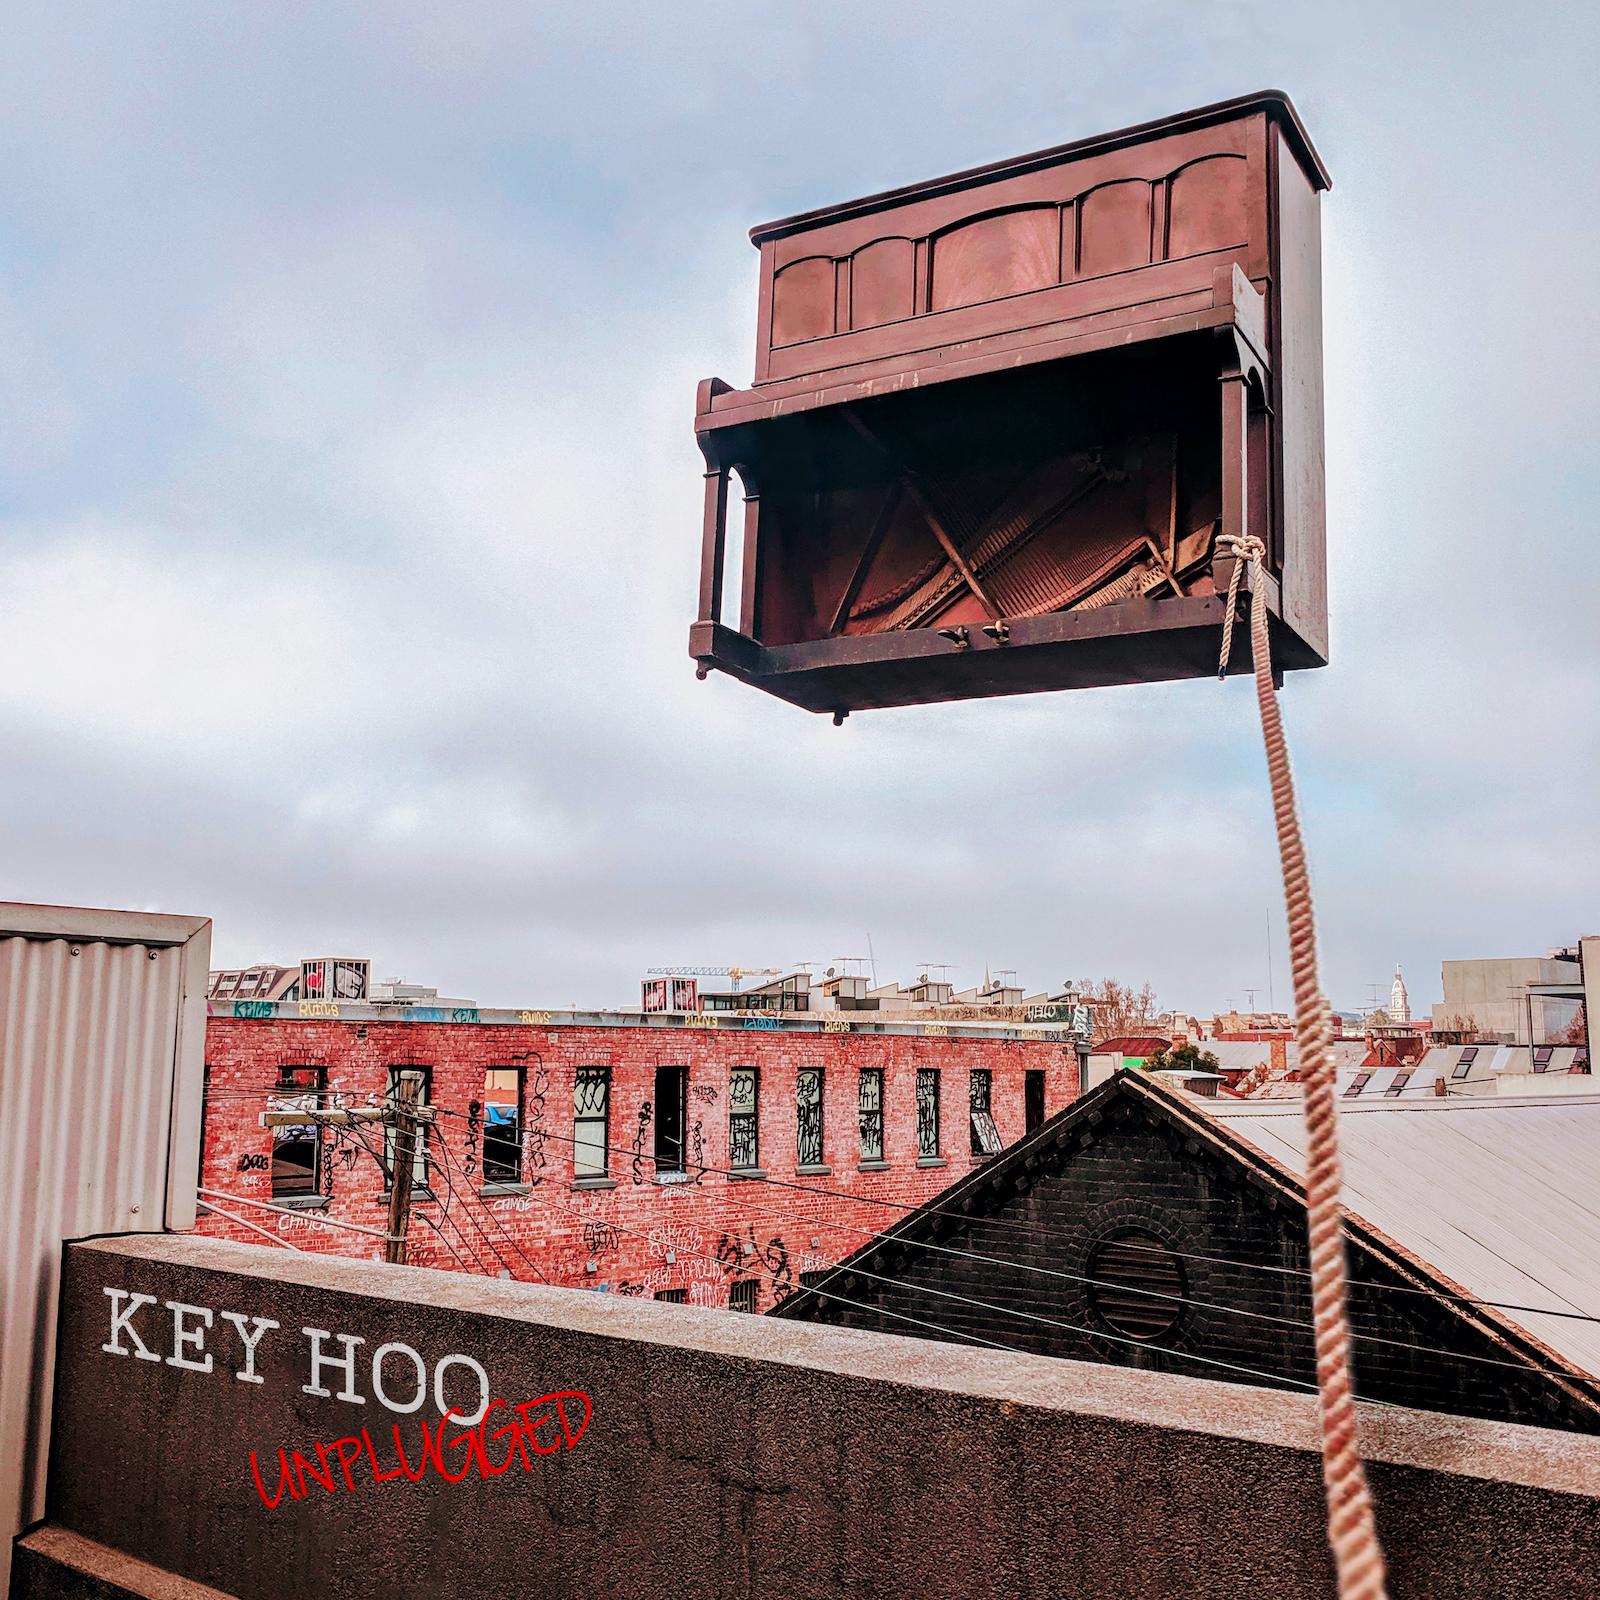 KEY HOO 'UNPLUGGED' EP